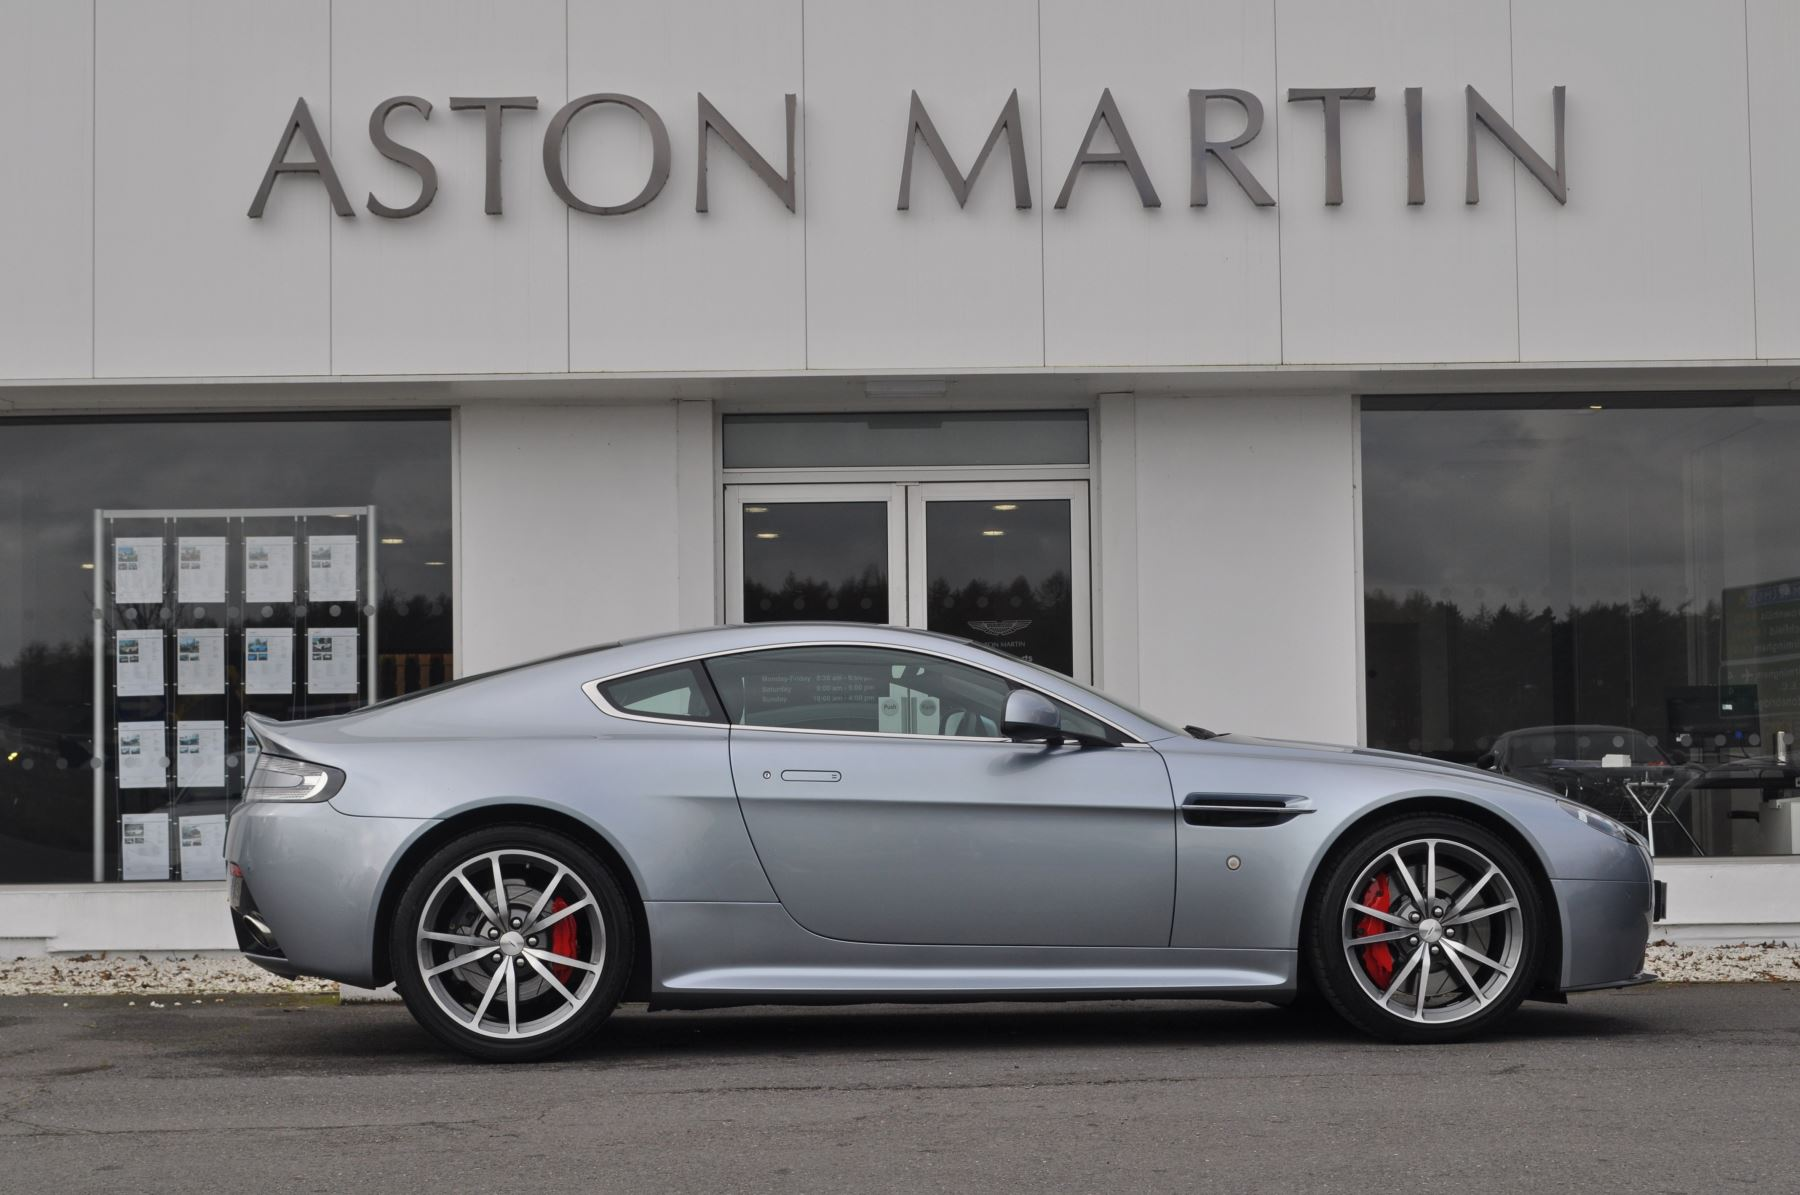 Aston Martin V8 Vantage S Coupe Coupe image 4